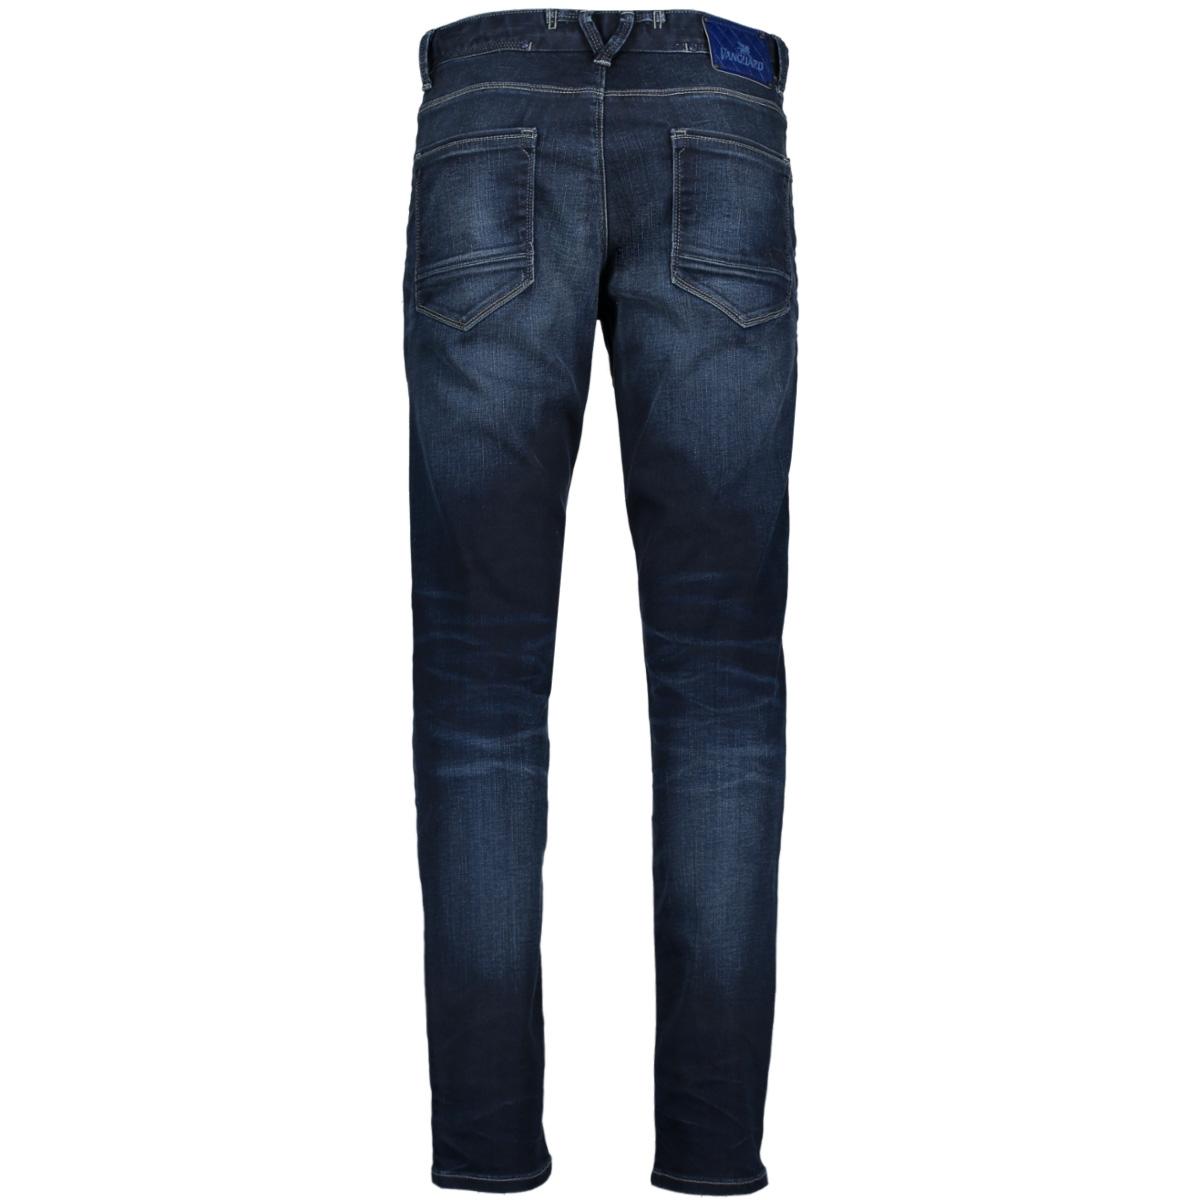 v7 slim intense indigo vtr186566 vanguard jeans ini